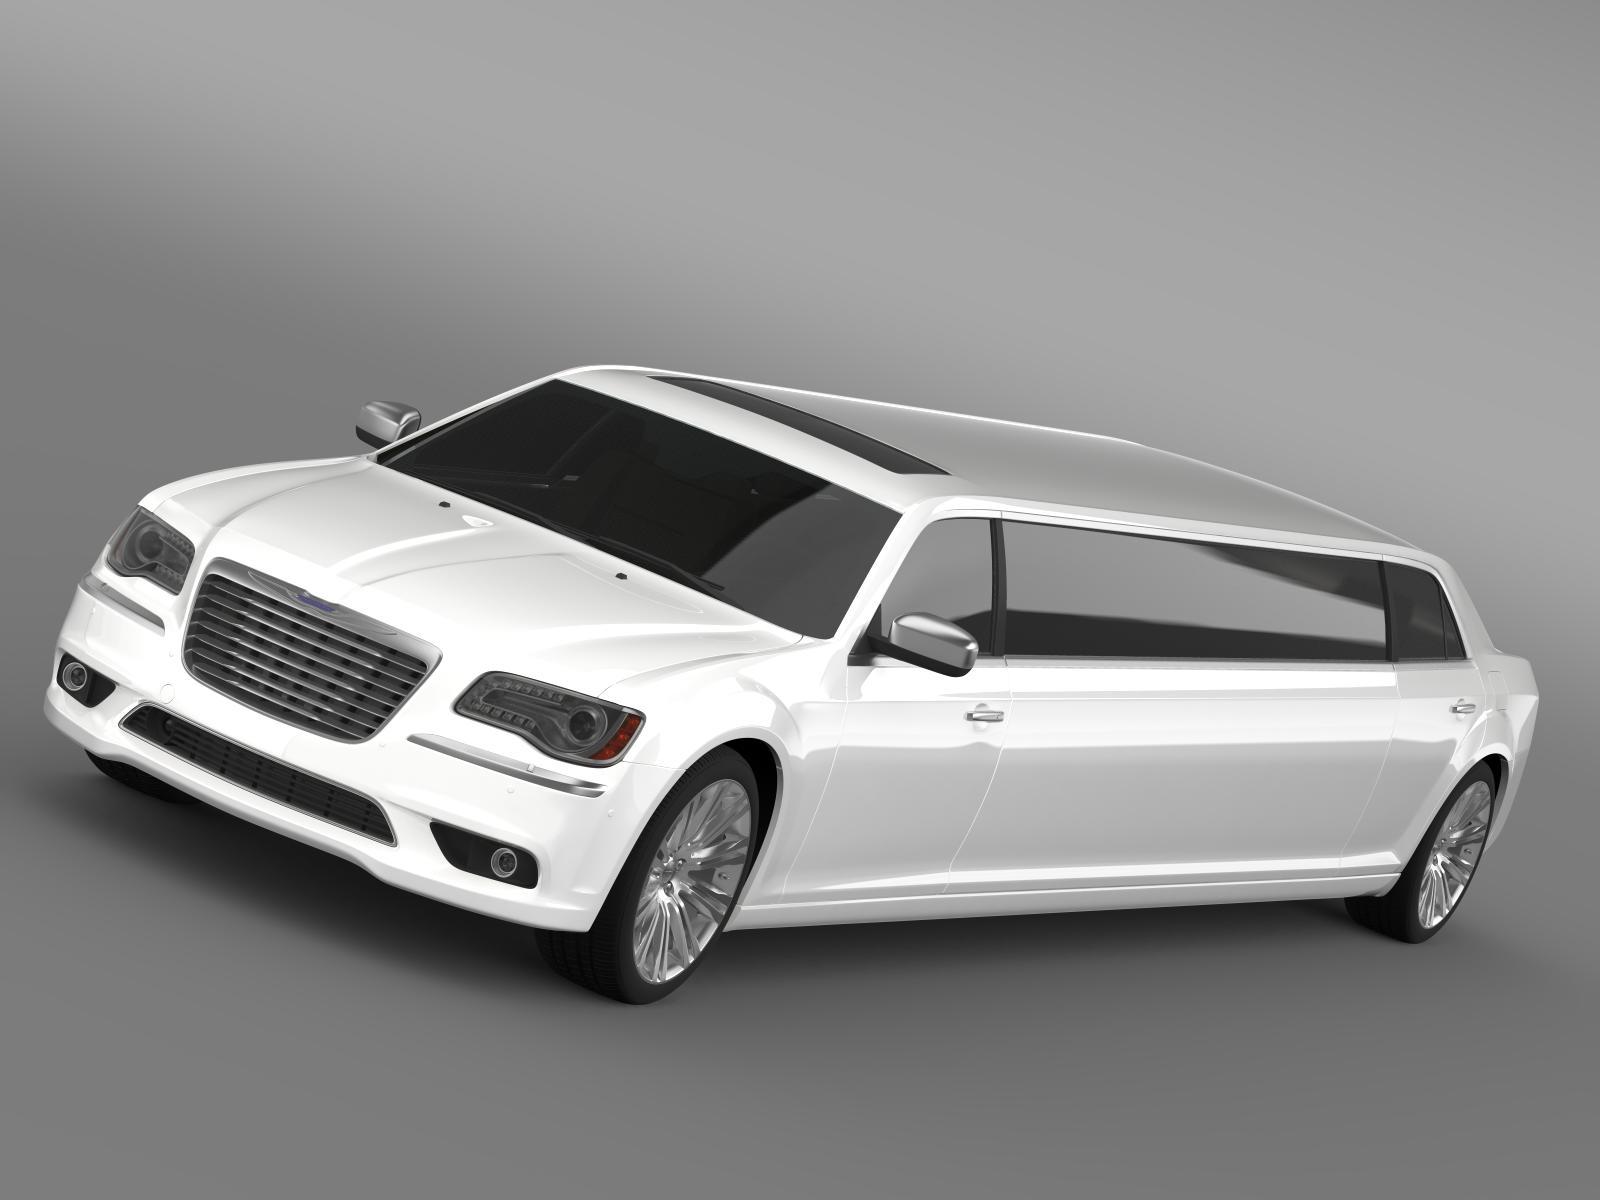 chrysler 300c 2013 limuzina 3d model 3ds max fbx c4d lwo ma mb hrc xsi obj 205612